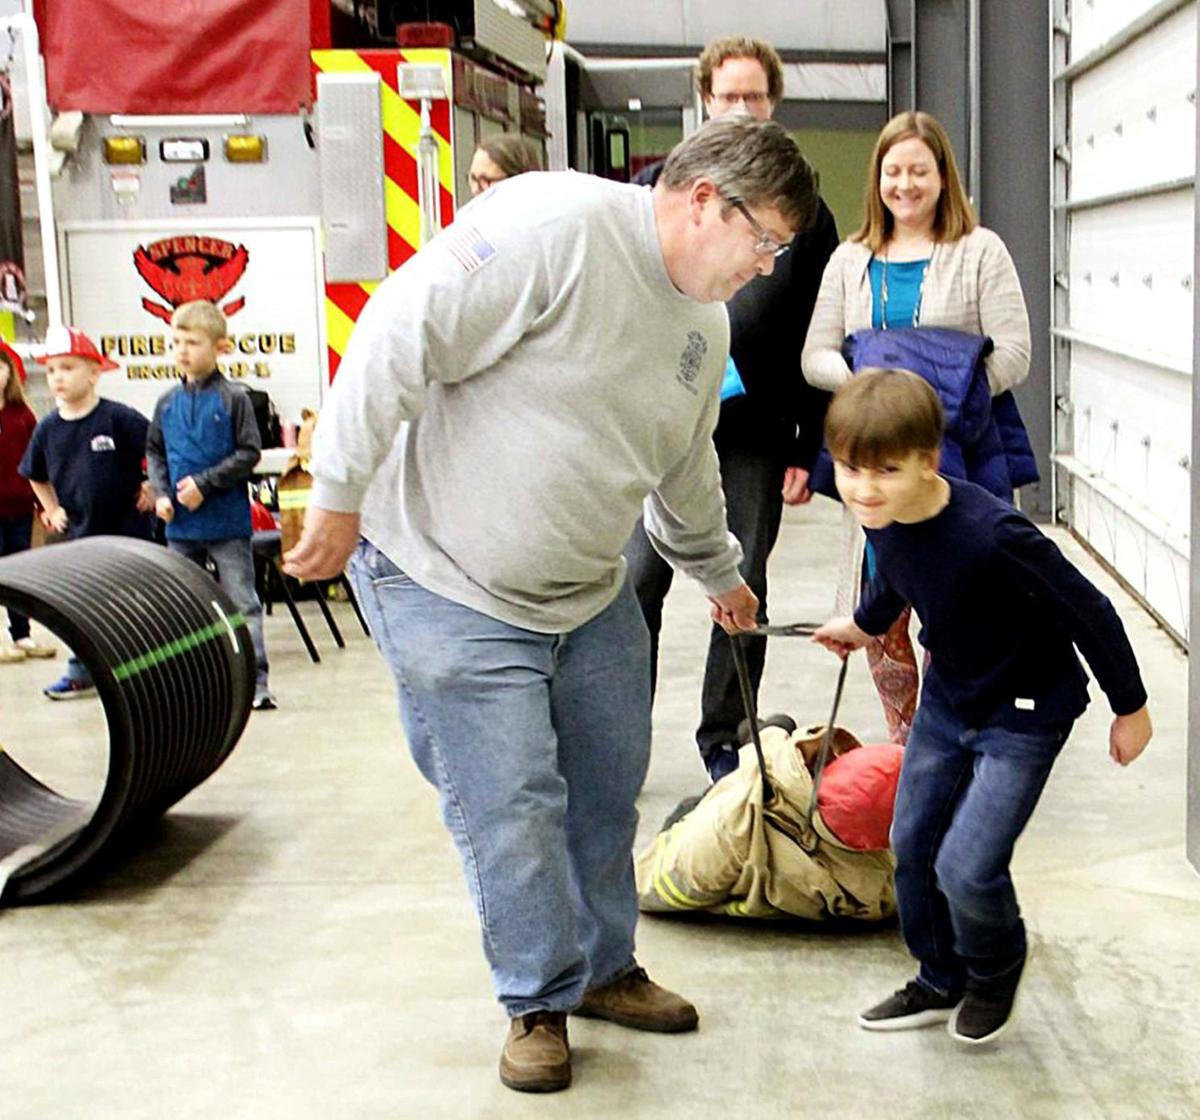 Spencer fire training center1